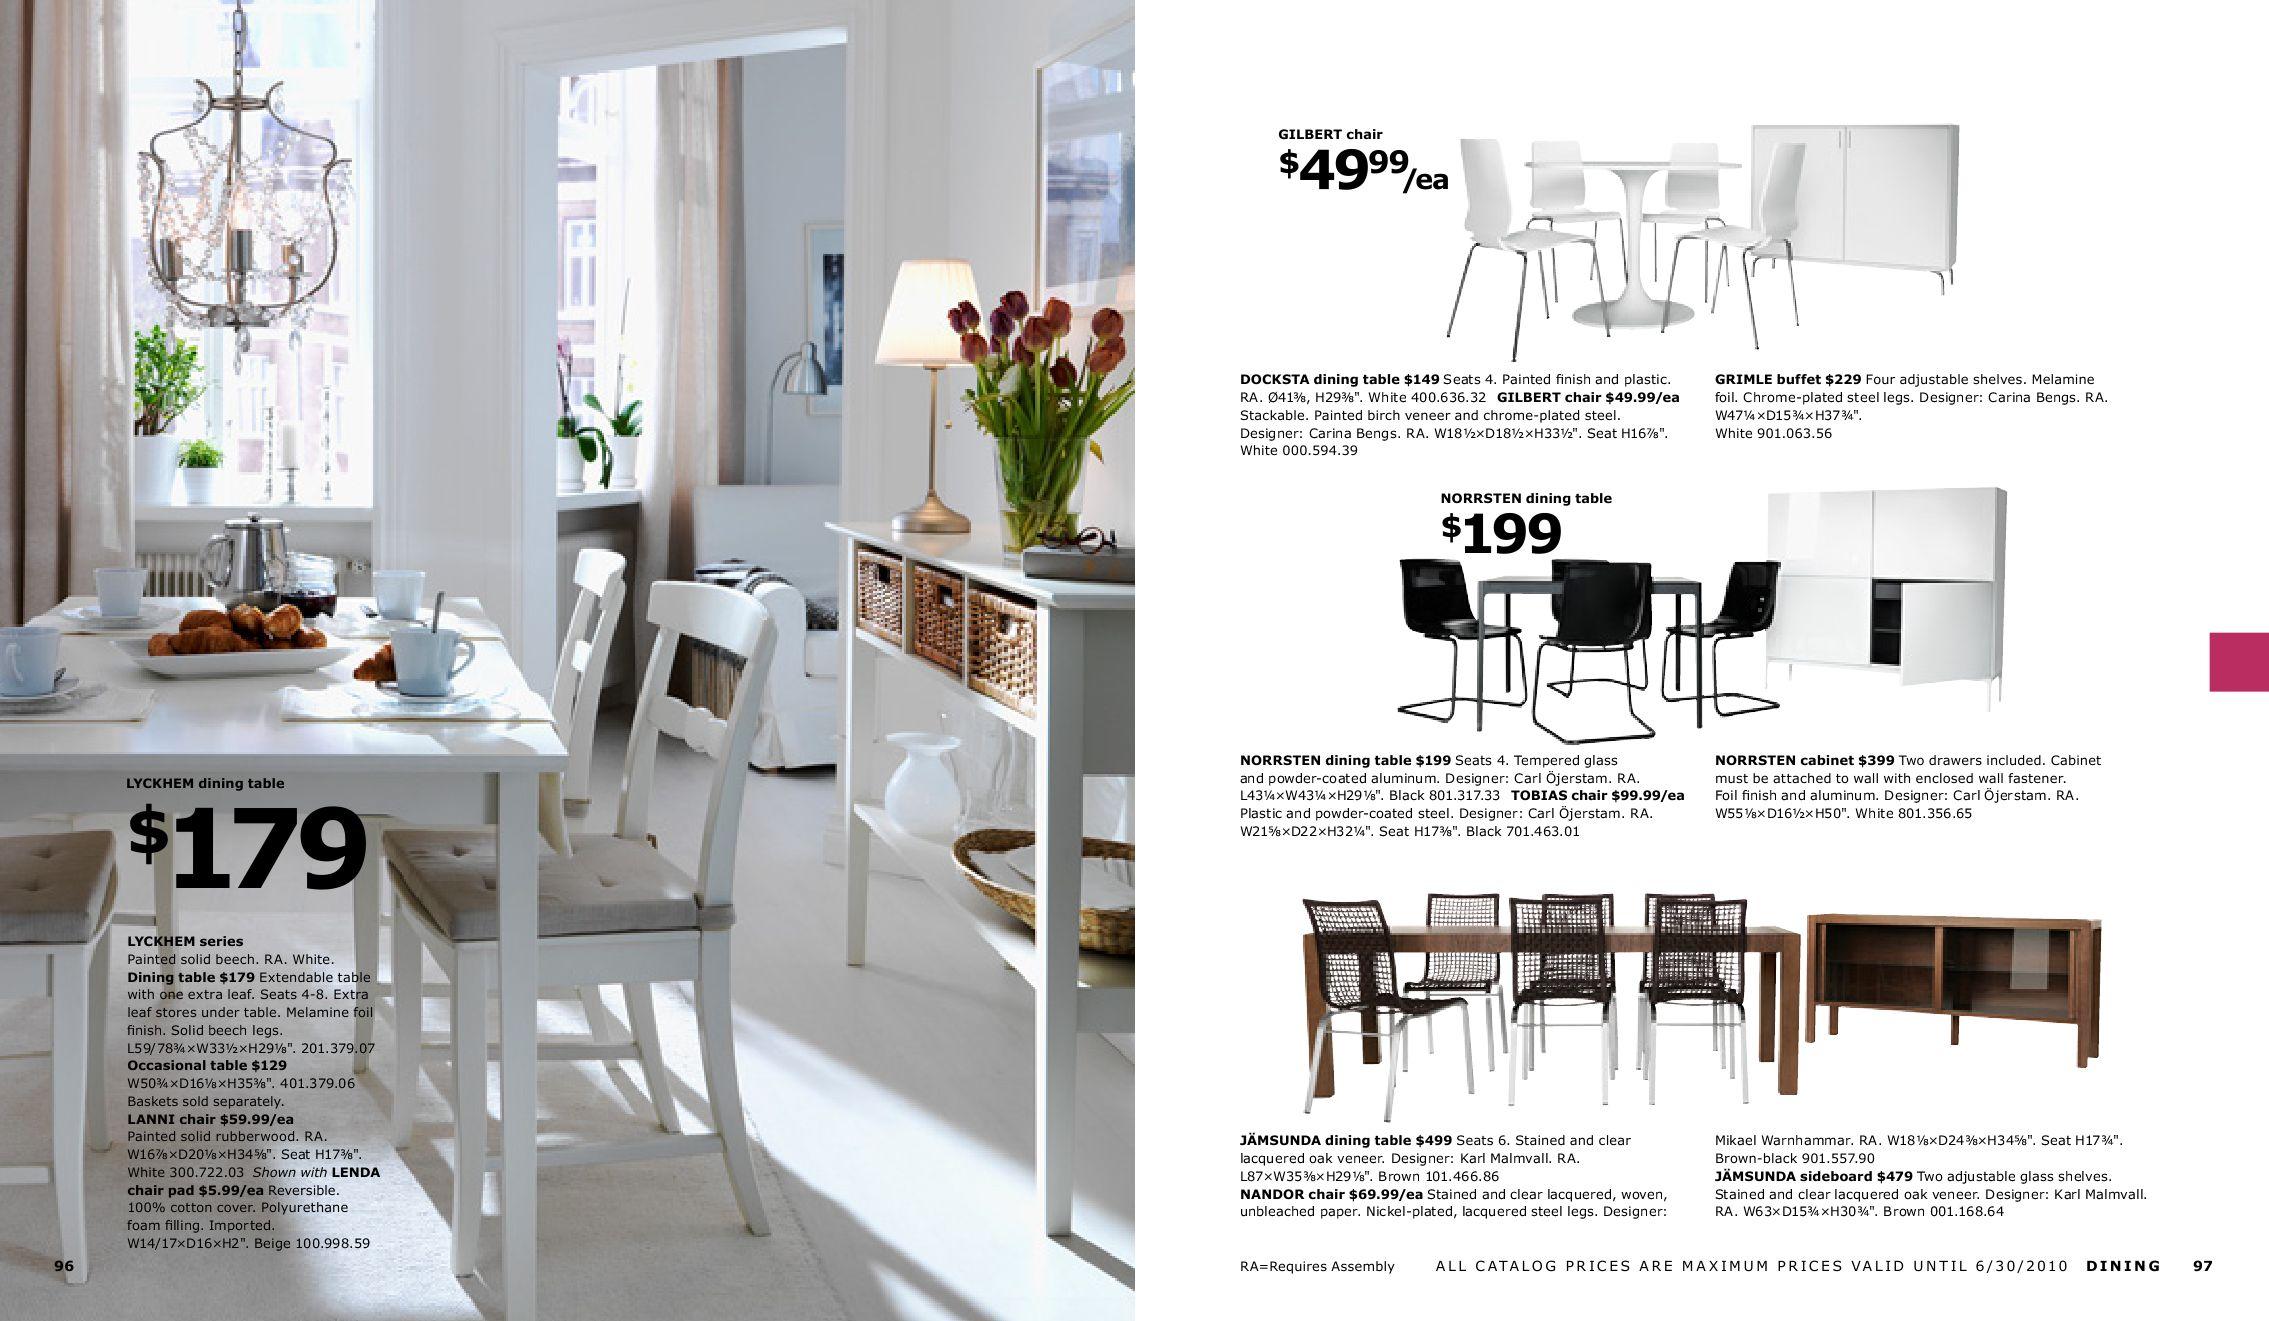 Ikea Esstisch Lyckhem ~ IKEA Catalog 2010 by Muhammad Mansour  issuu